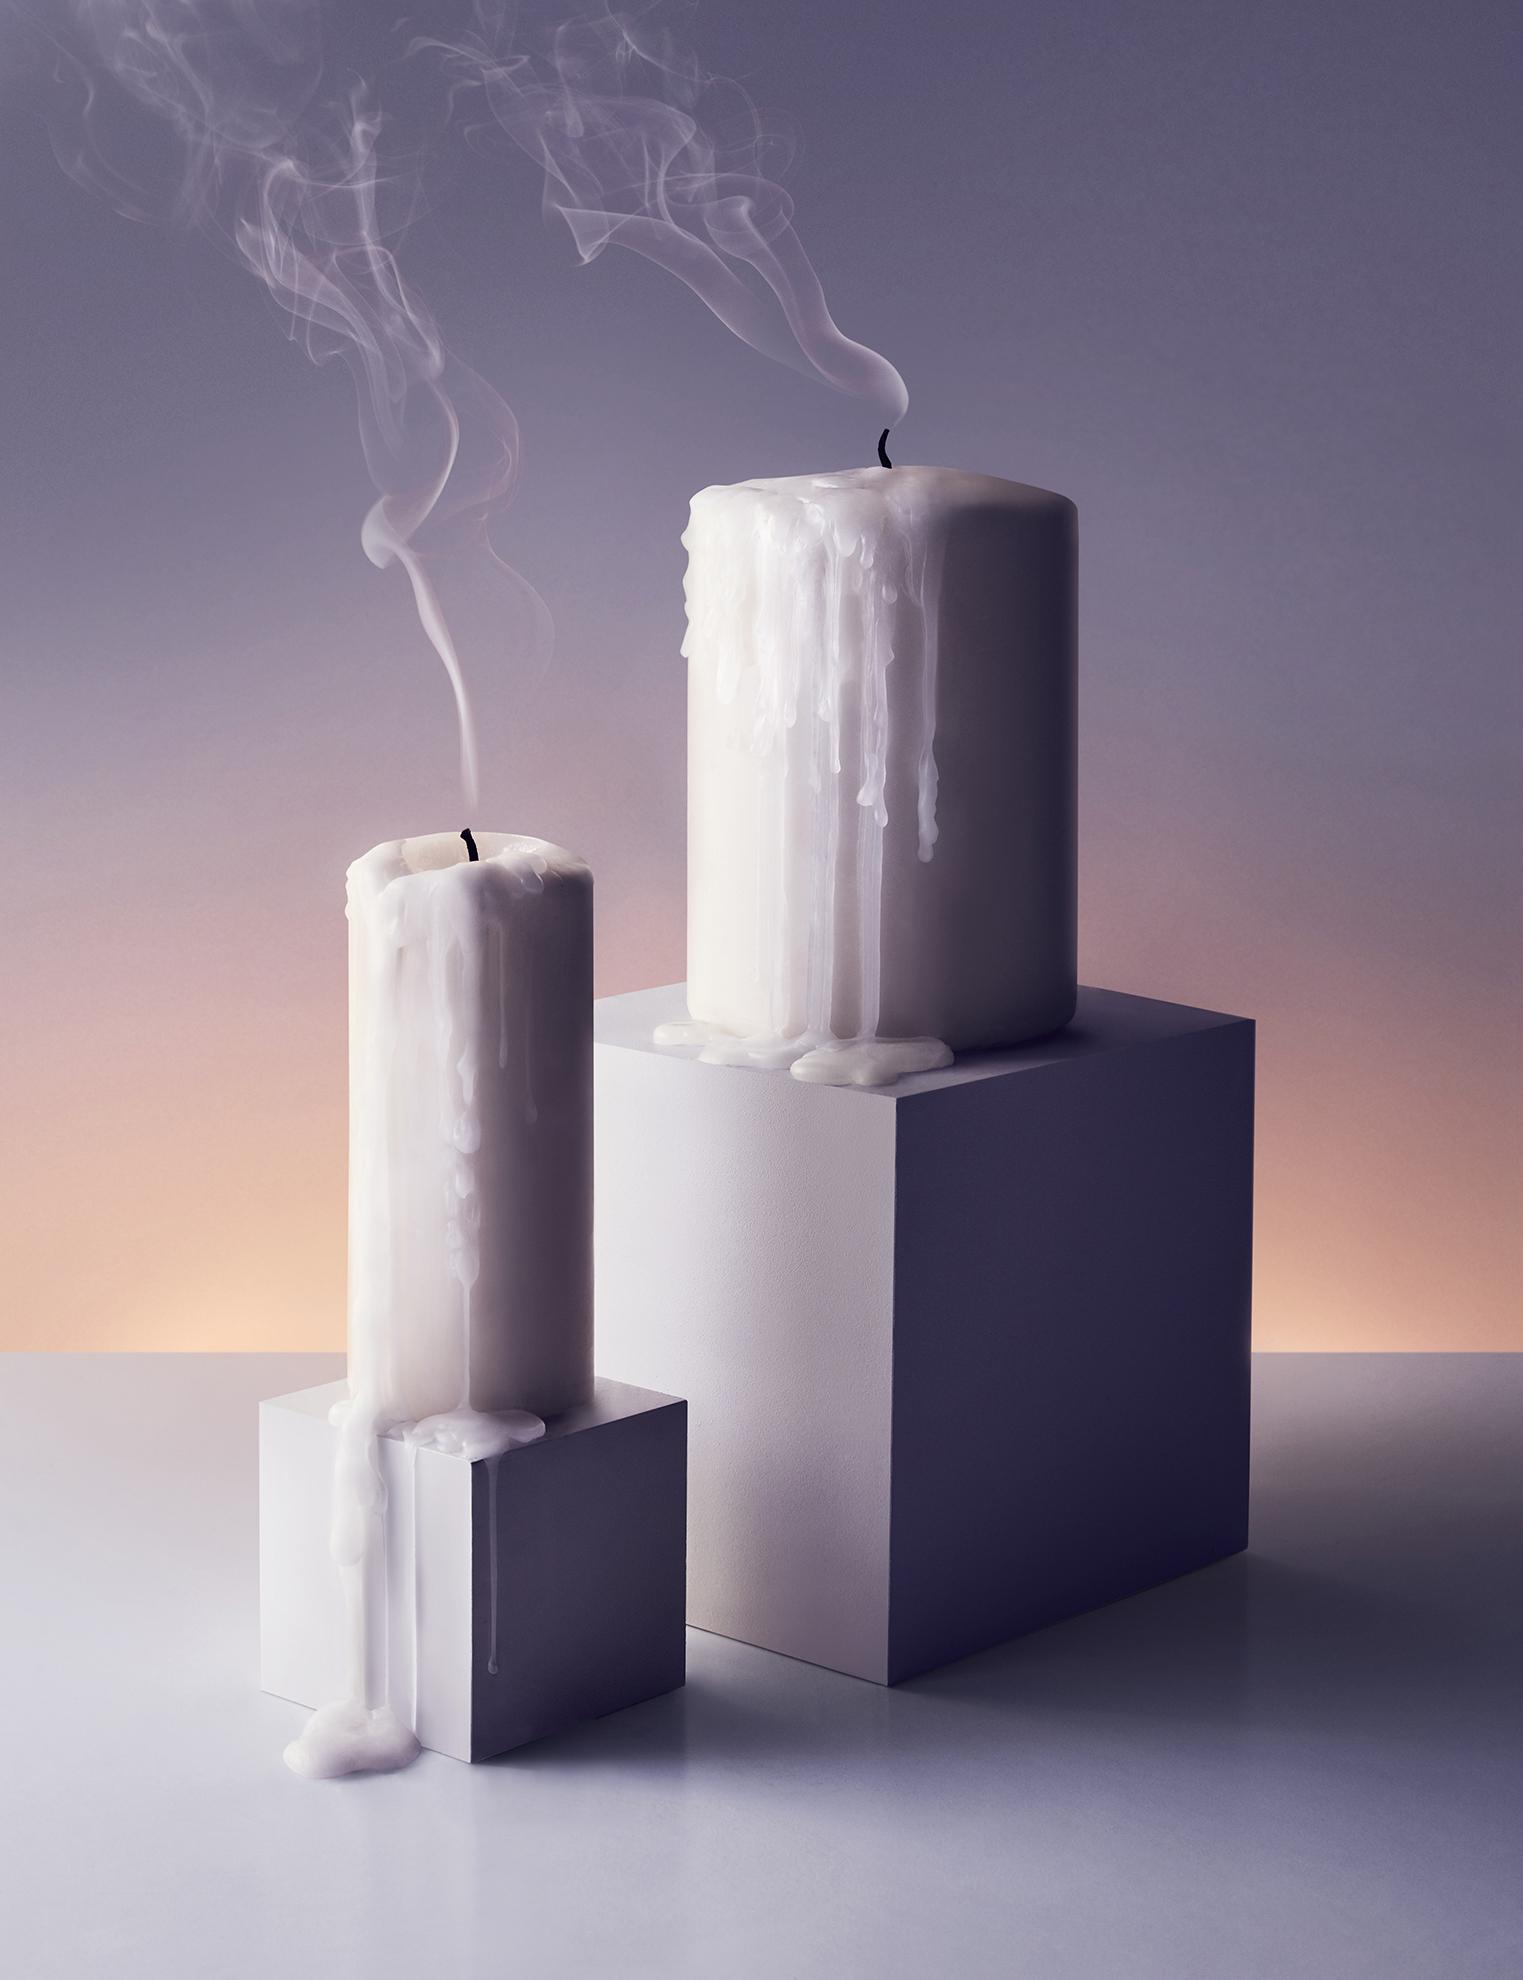 stil-life-photographer-london-nyc-paris-art-photography-joshua-caudwell-art-photo-candles-1.jpg